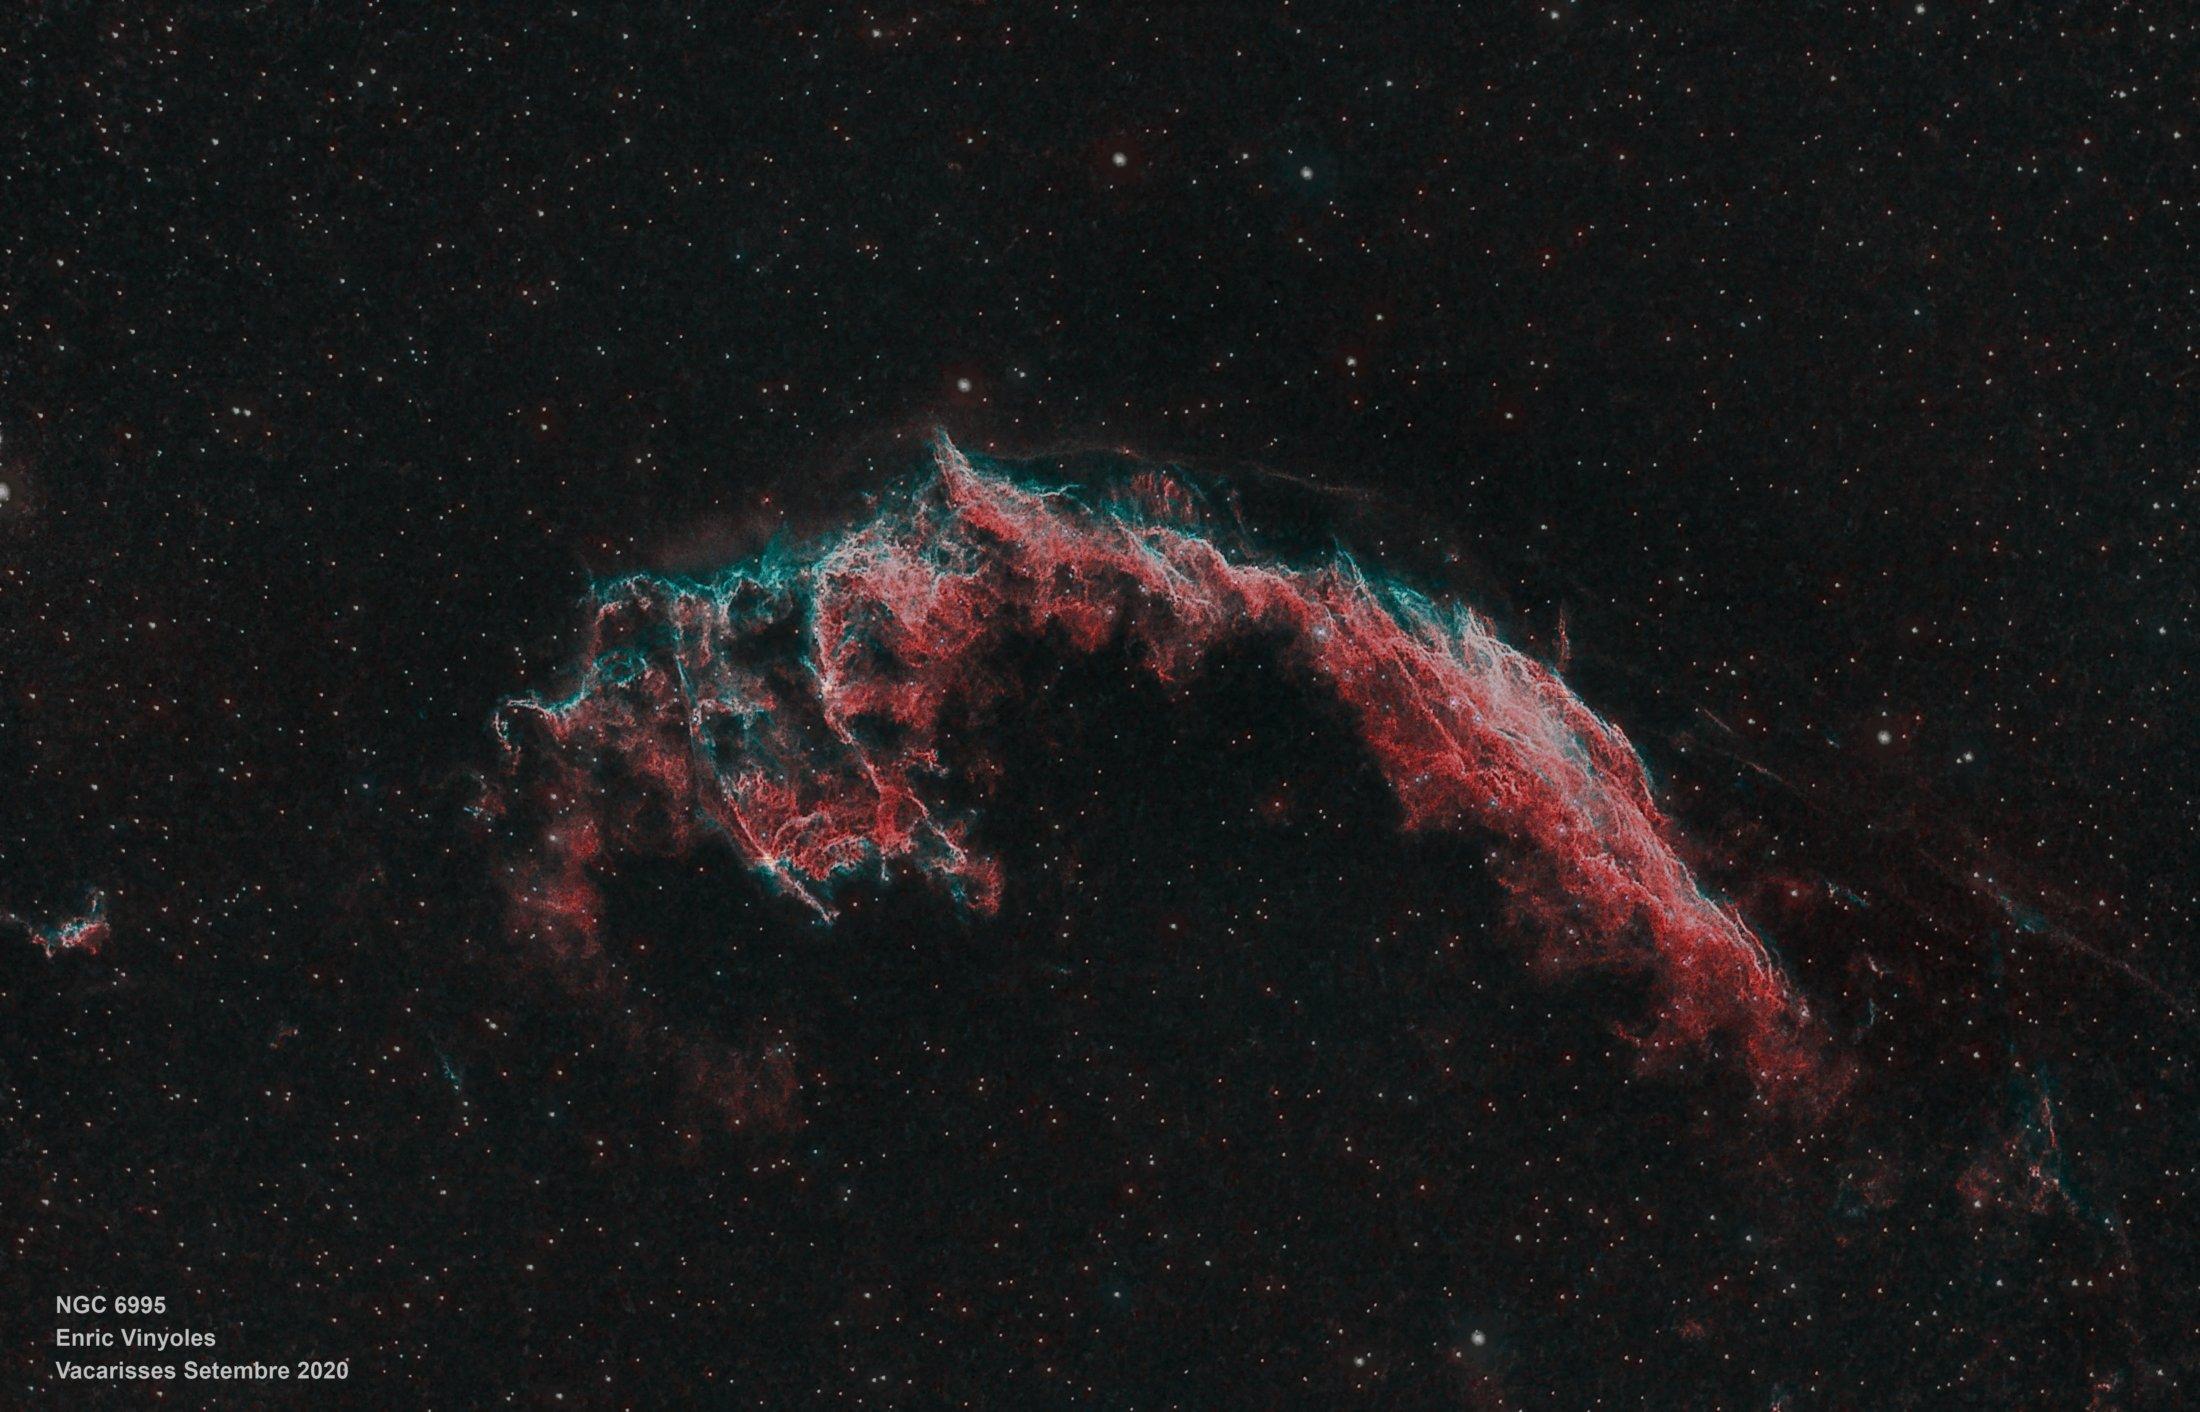 NGC6995 - Enric Vinyoles